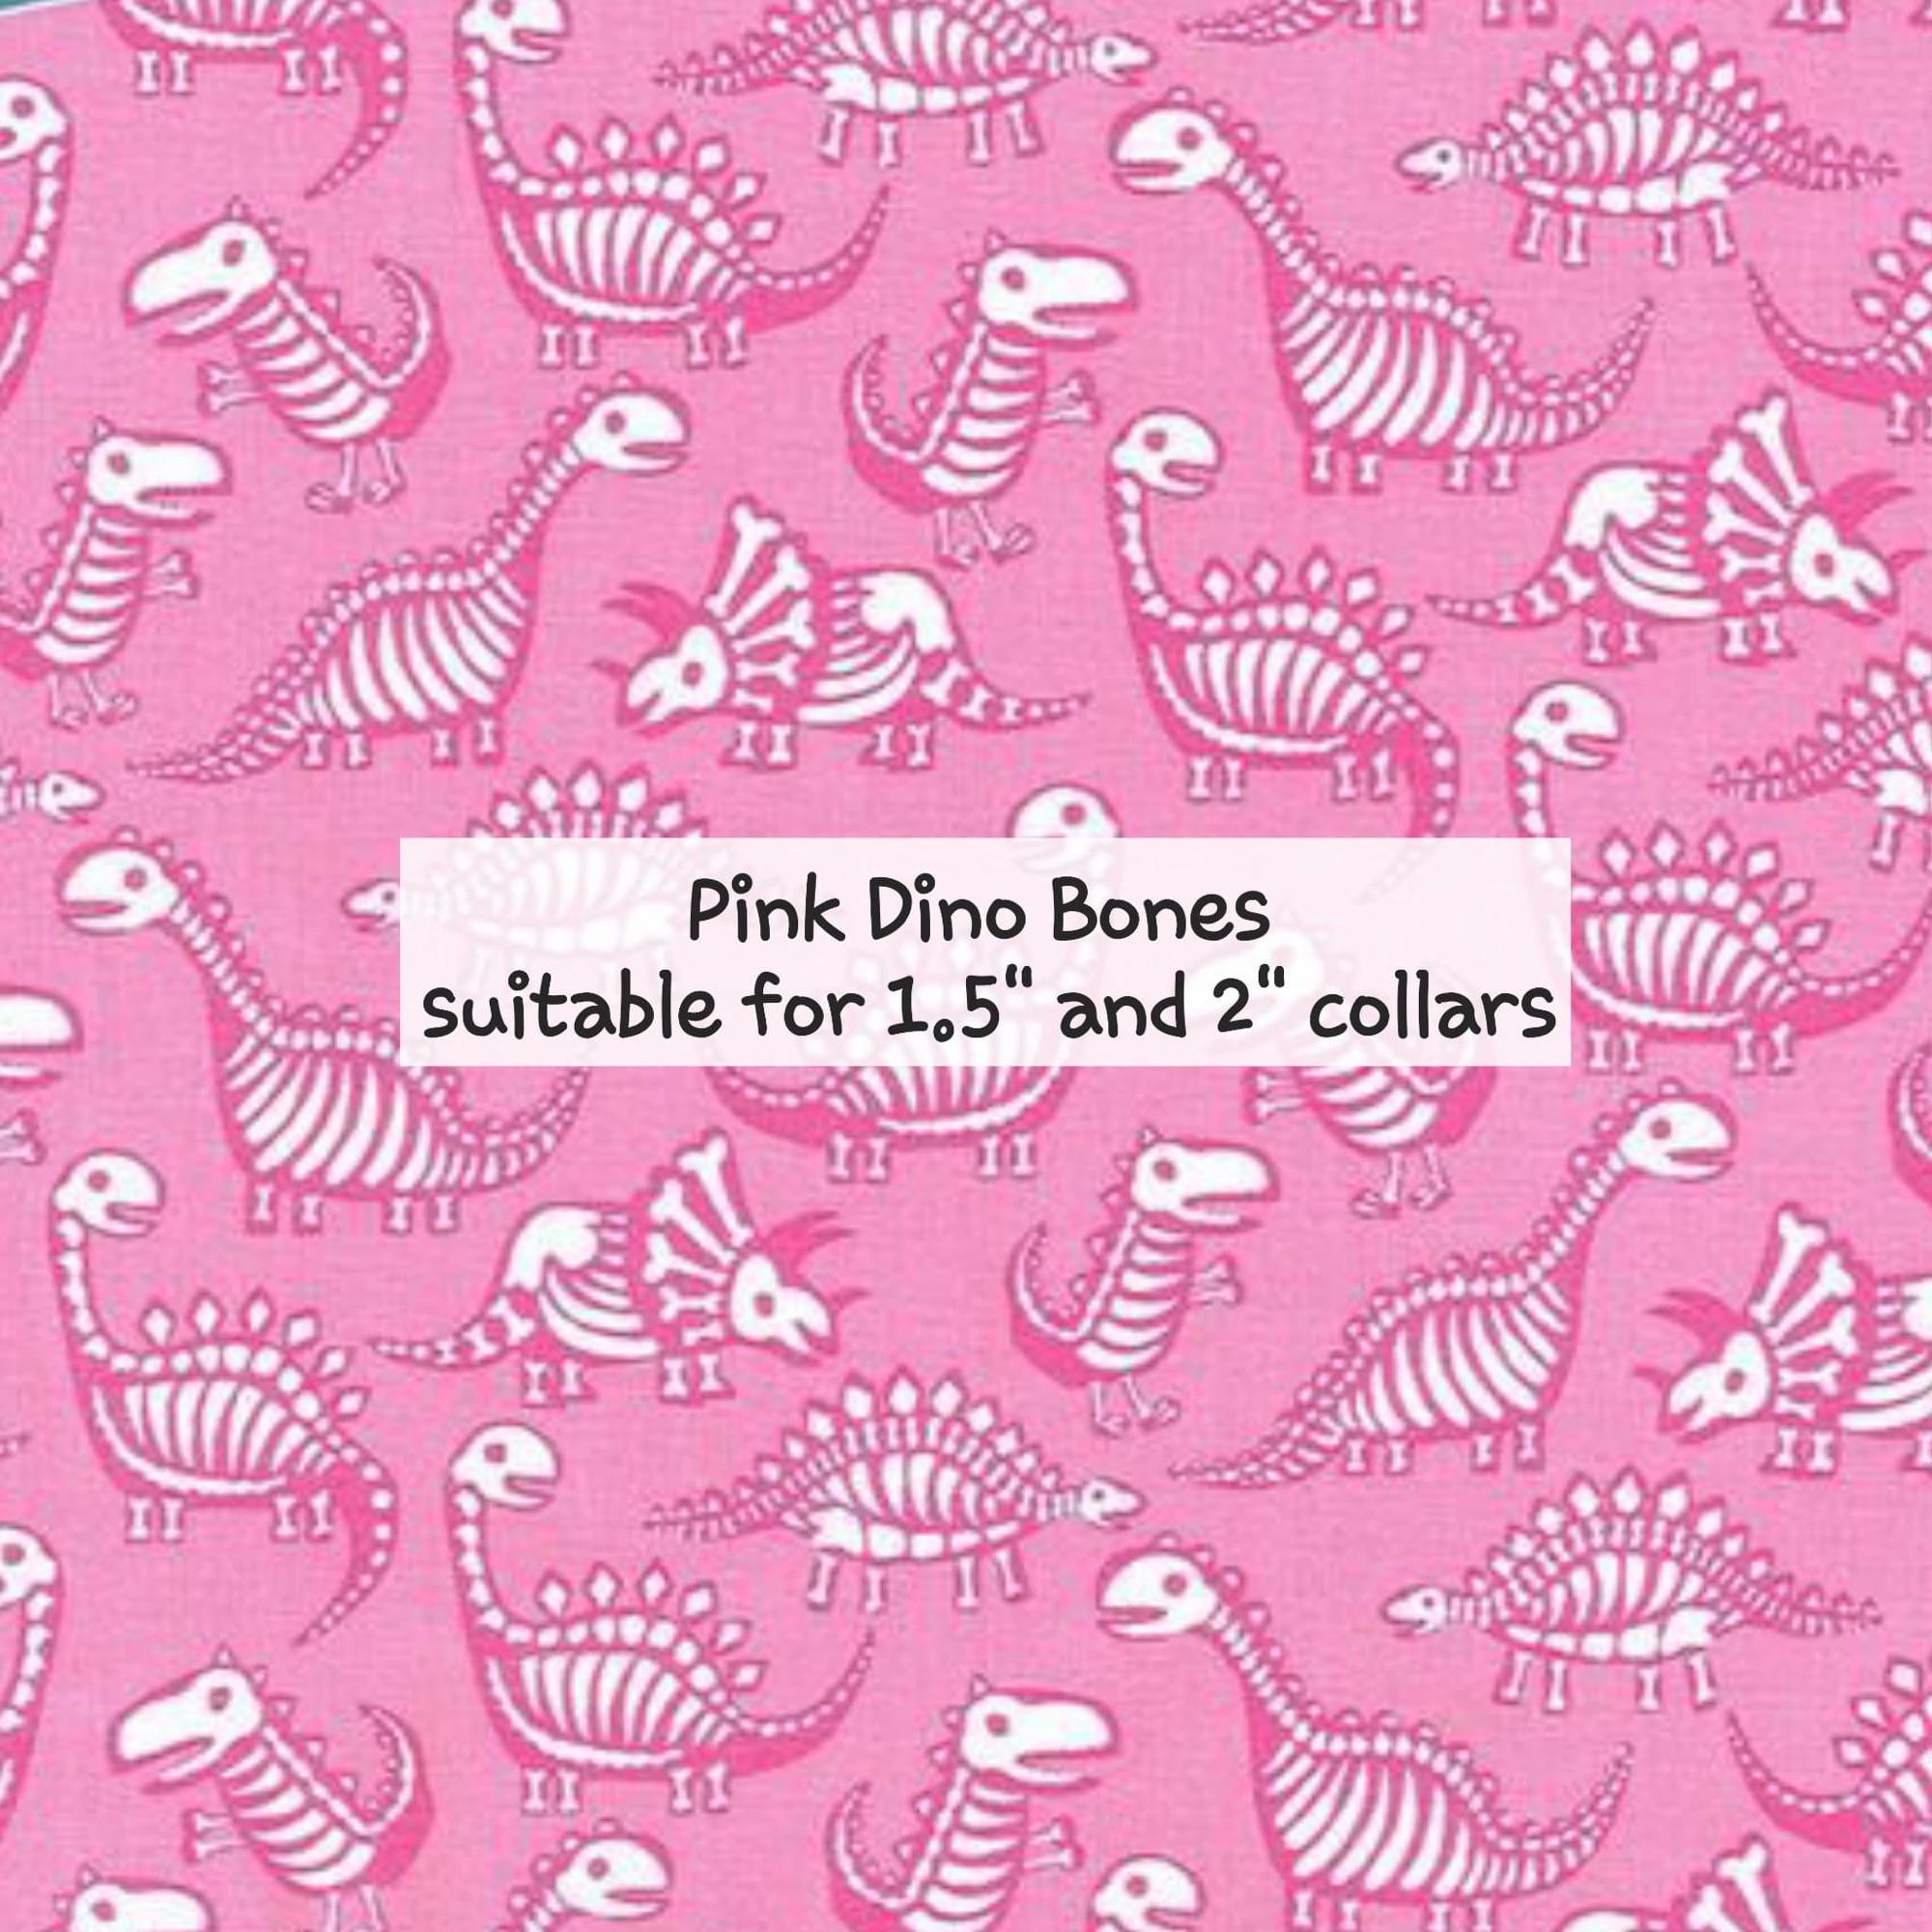 pink dino bones